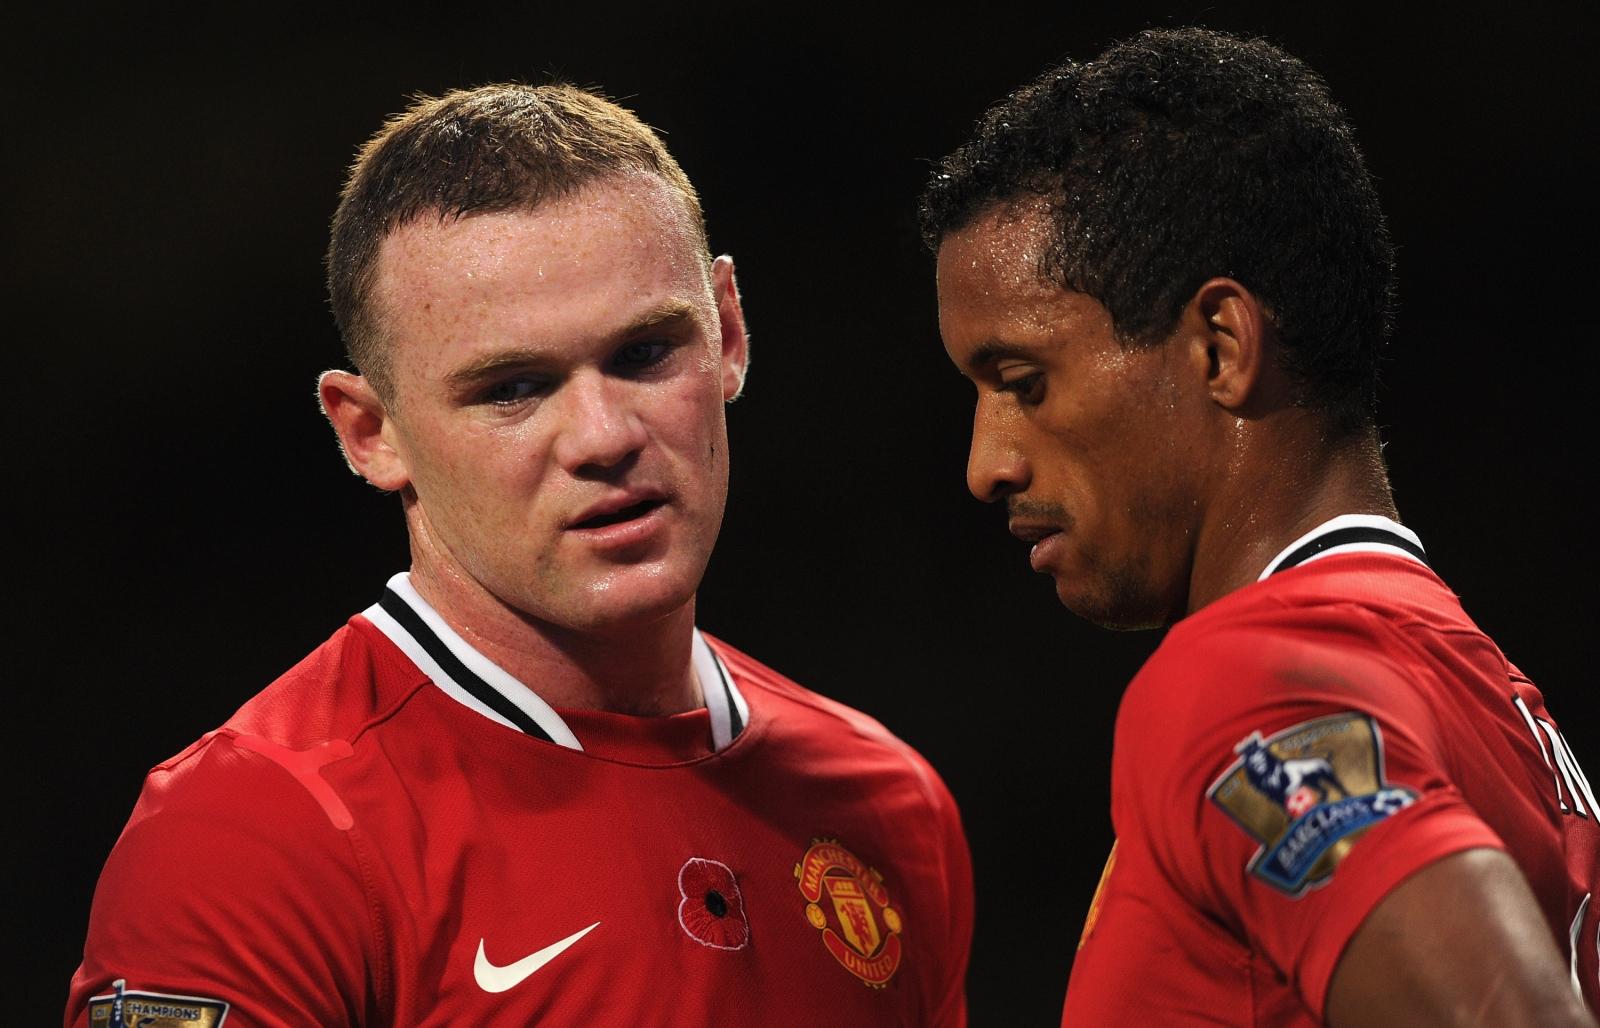 Wayne Rooney (left) and Nani